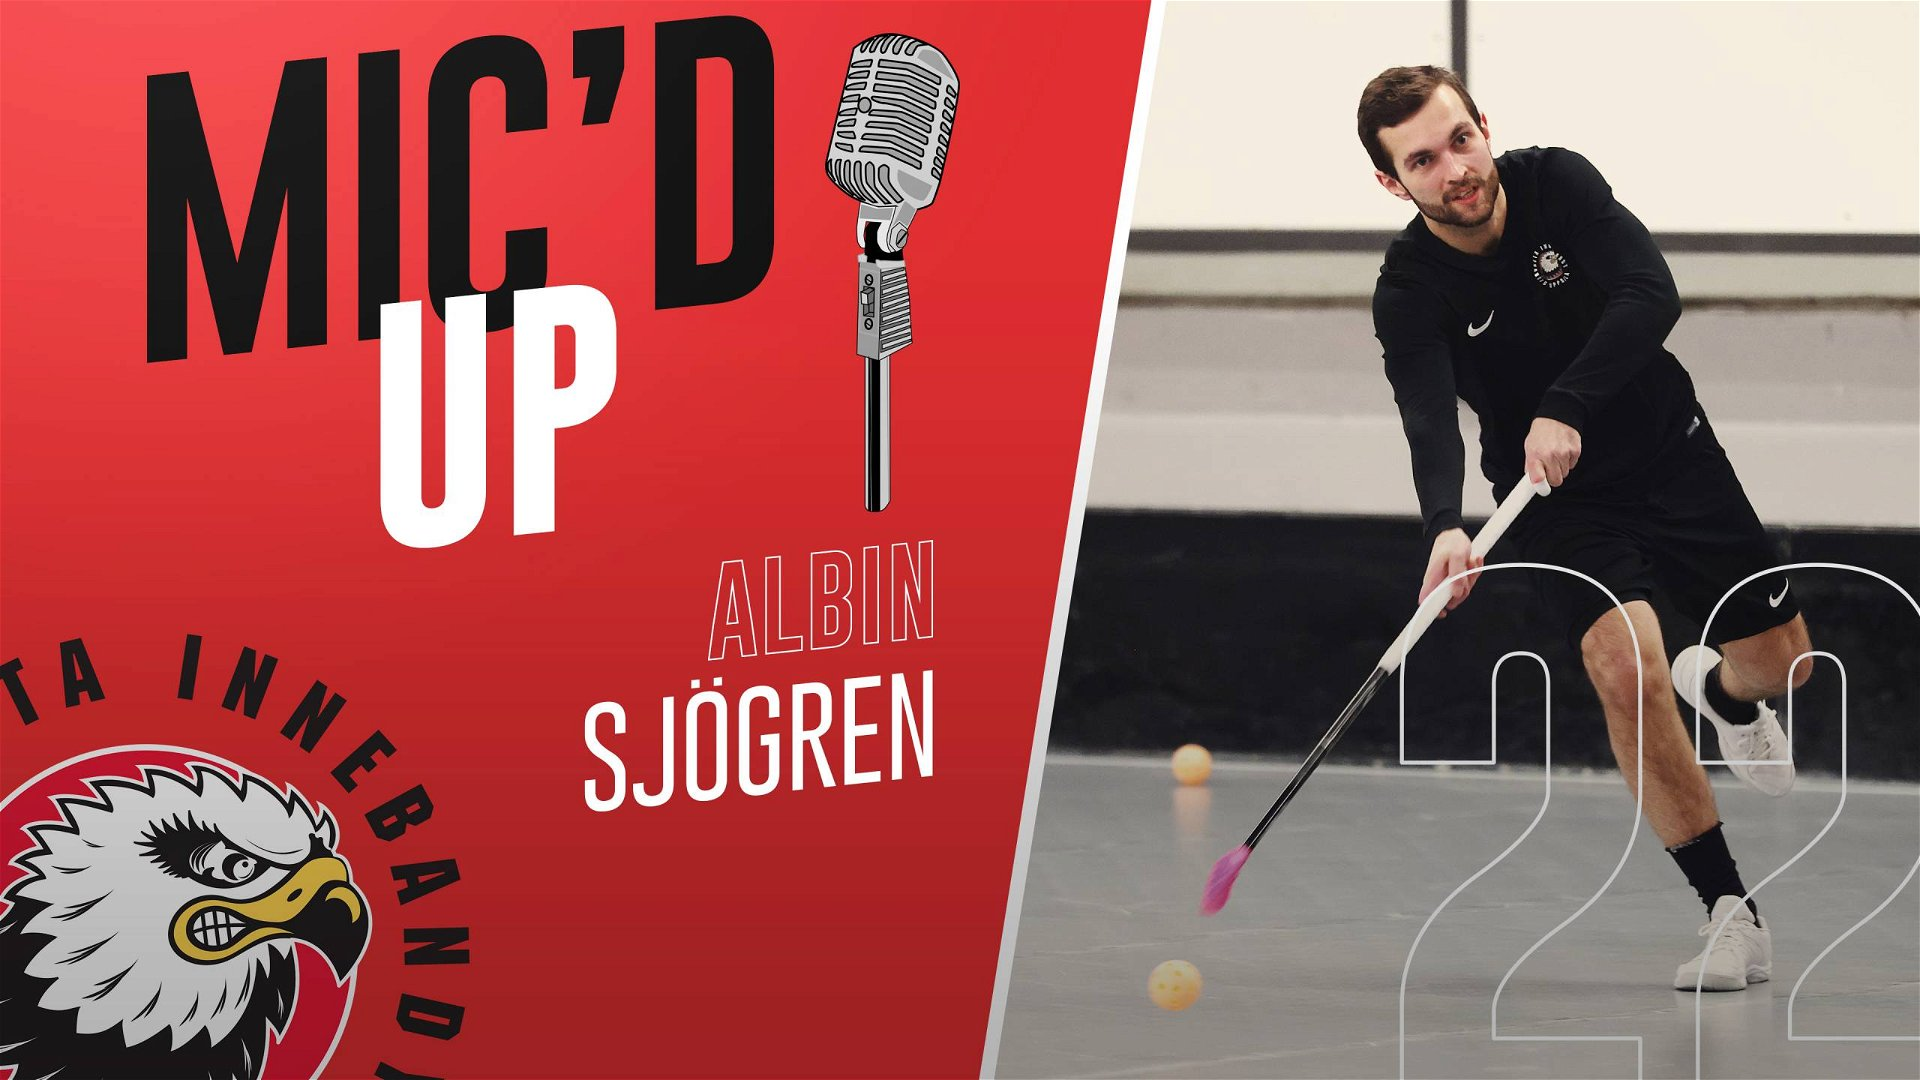 Mic'd Up – Albin Sjögren